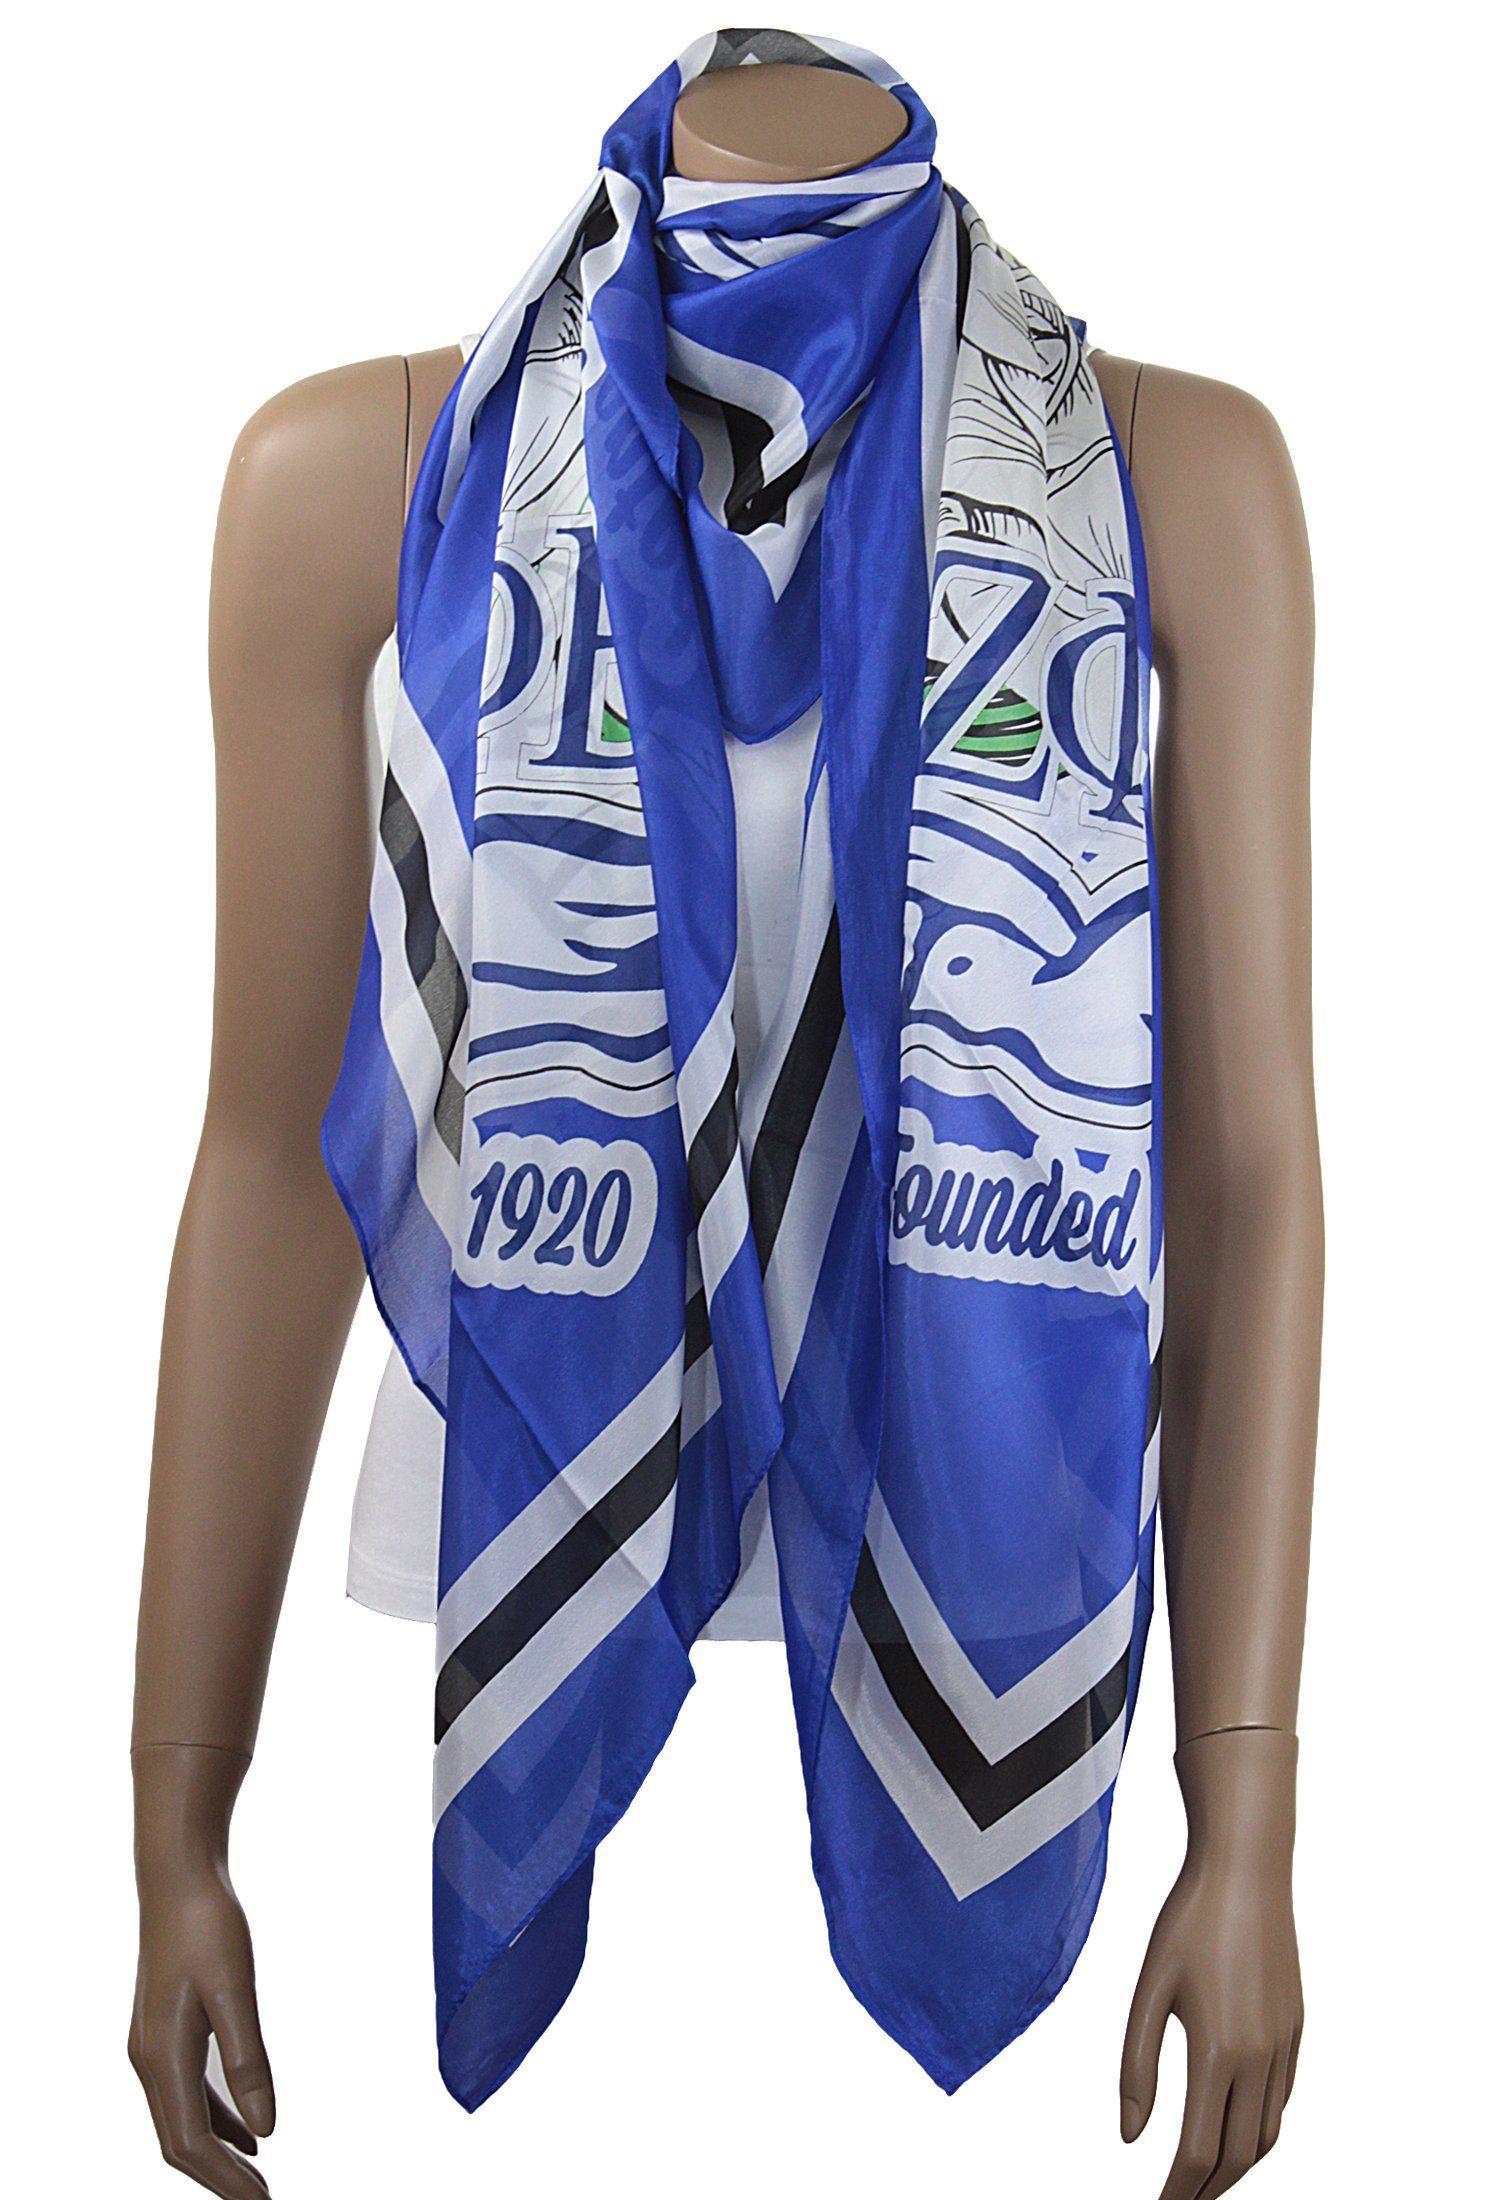 Zeta phi beta oversized faux silk scarf 36x72 inches apparel zeta phi beta oversized faux silk scarf 36x72 inches buycottarizona